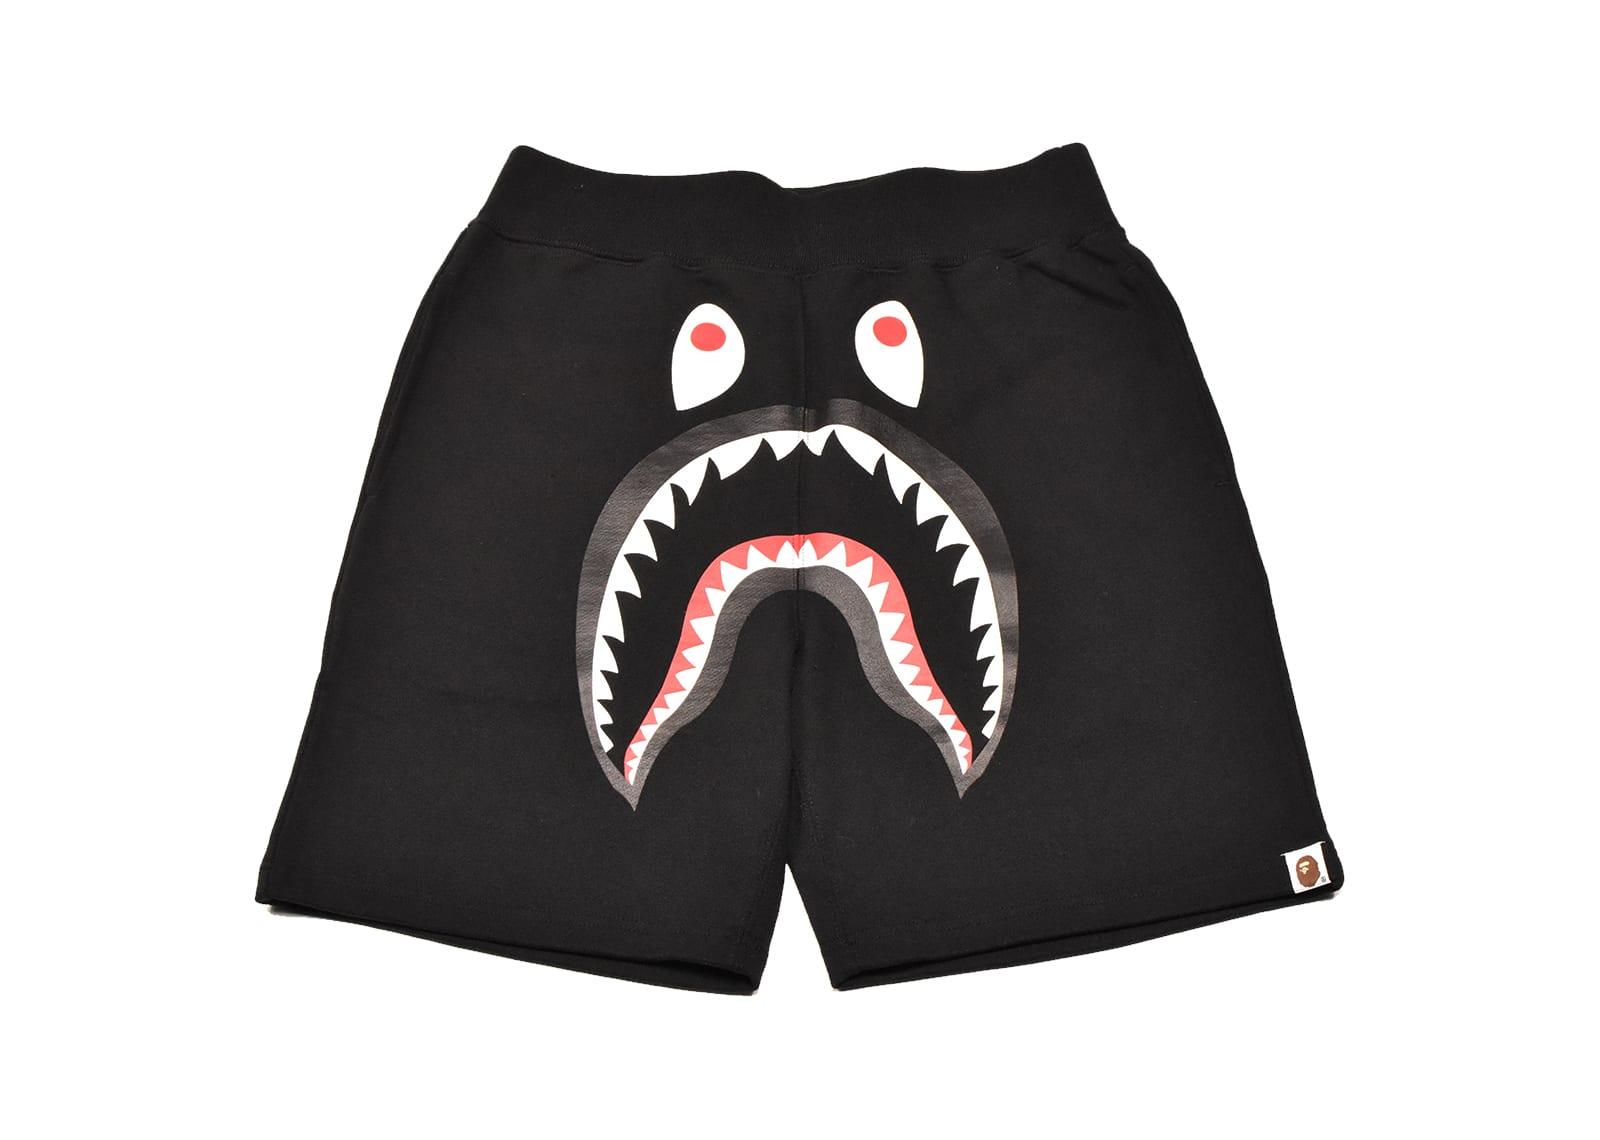 a7450aa977 Bape Shark Sweat Shorts Black - kickstw